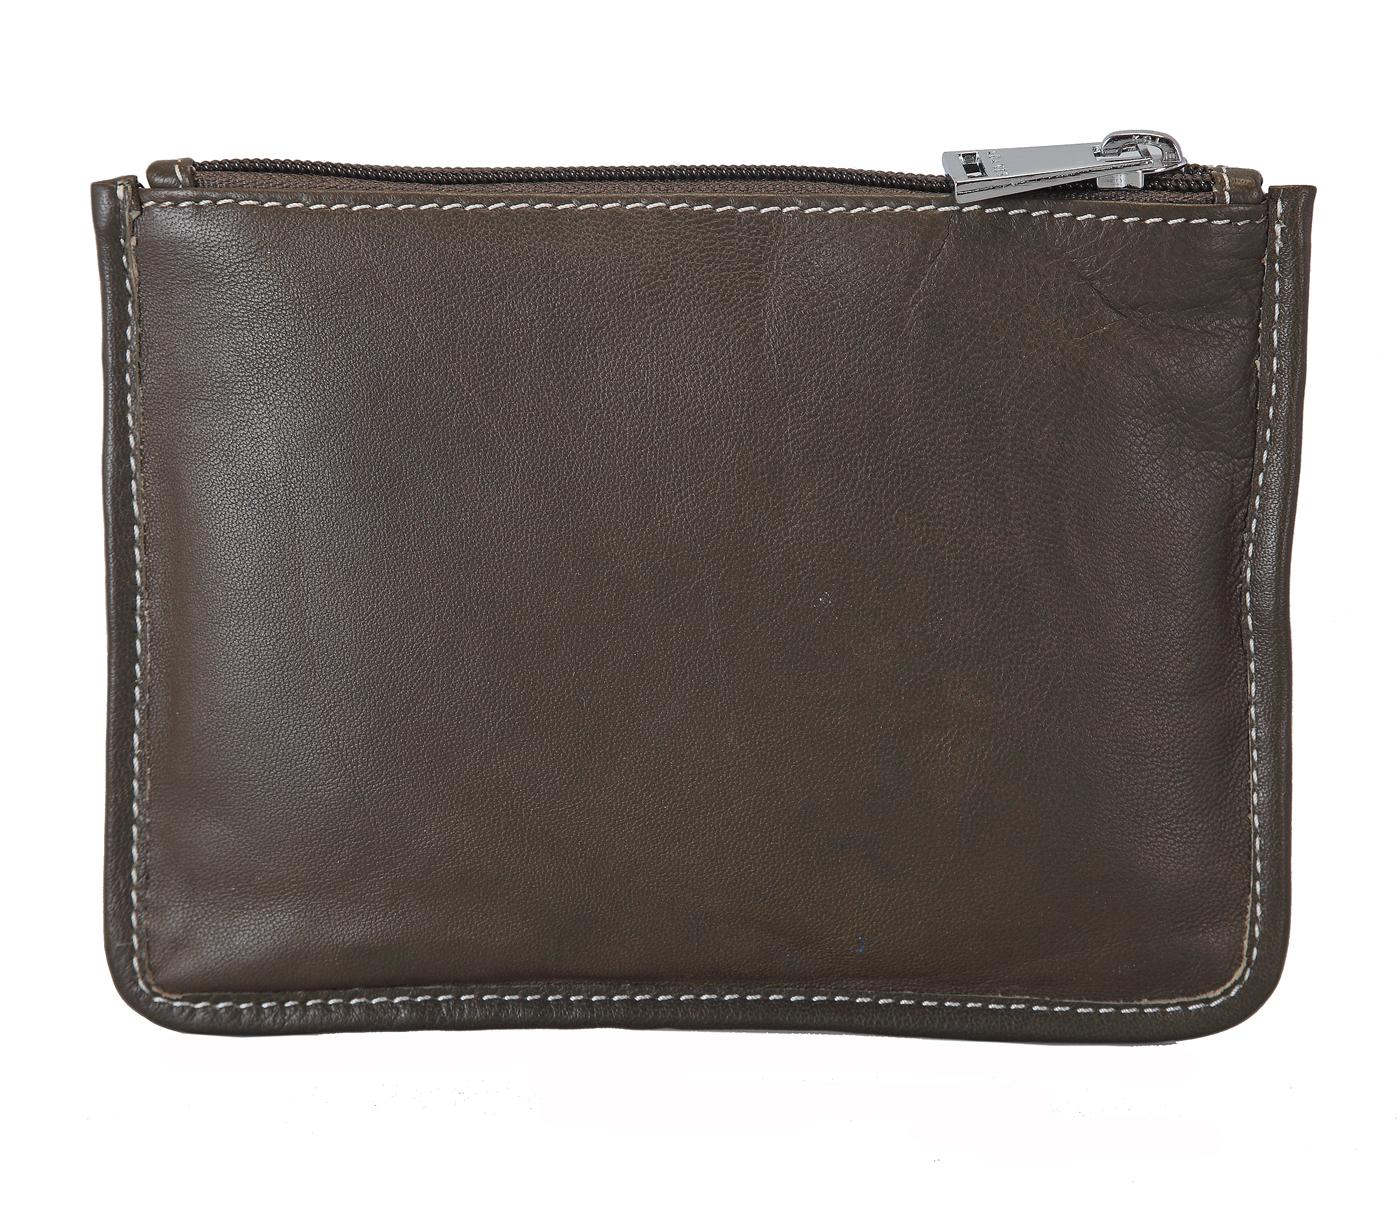 W228--Unisex multi purpose pouch in Genuine Leather - Green